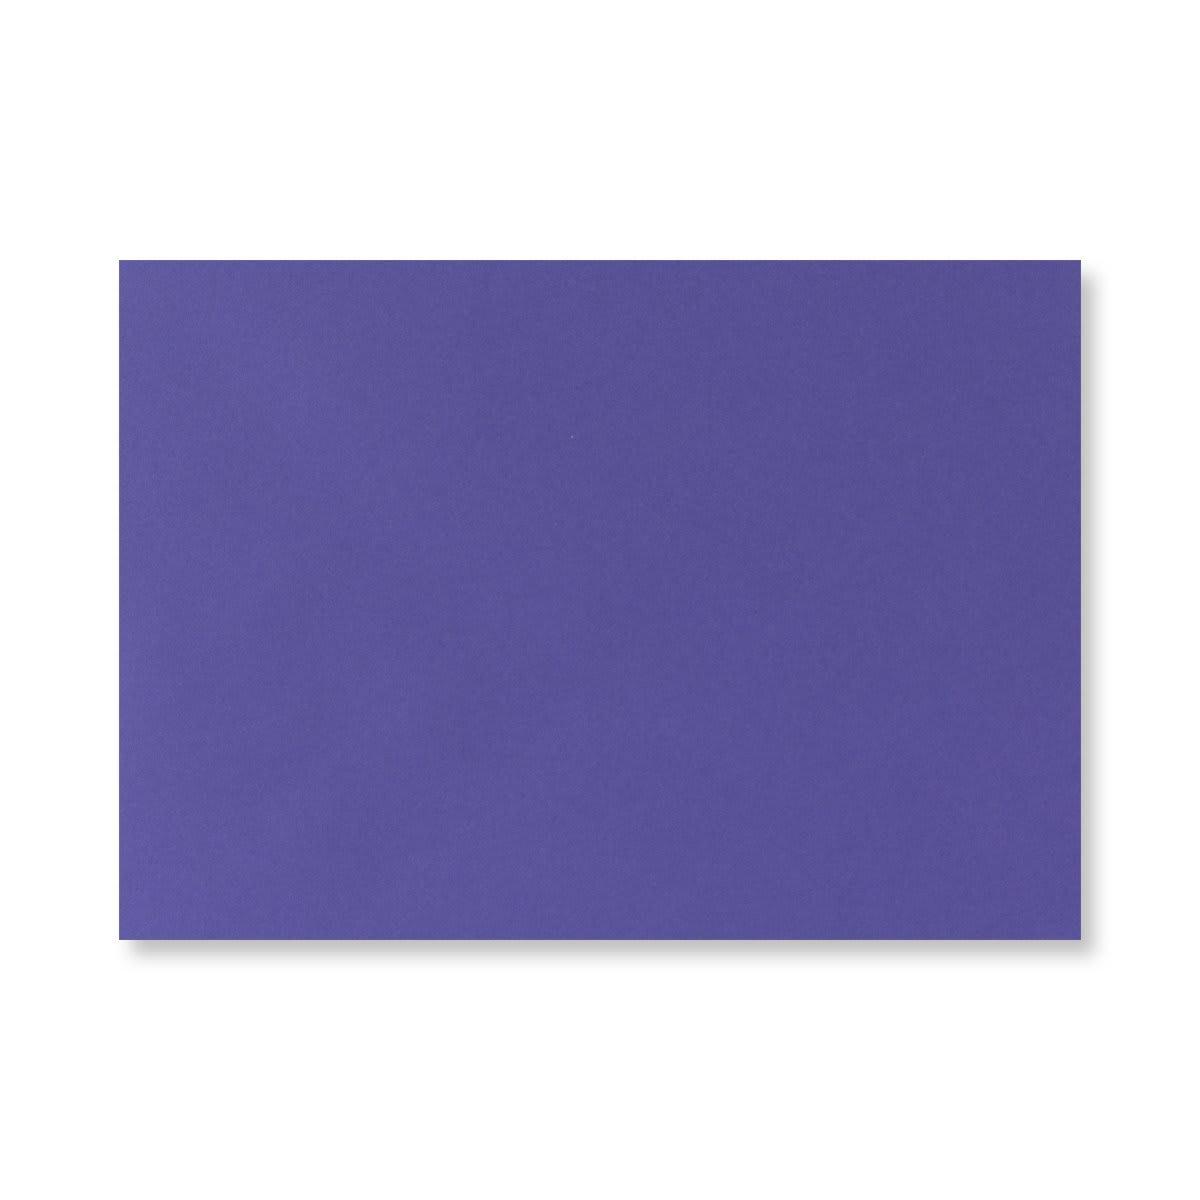 IRIS BLUE 133 x 184 mm ENVELOPES (i8)